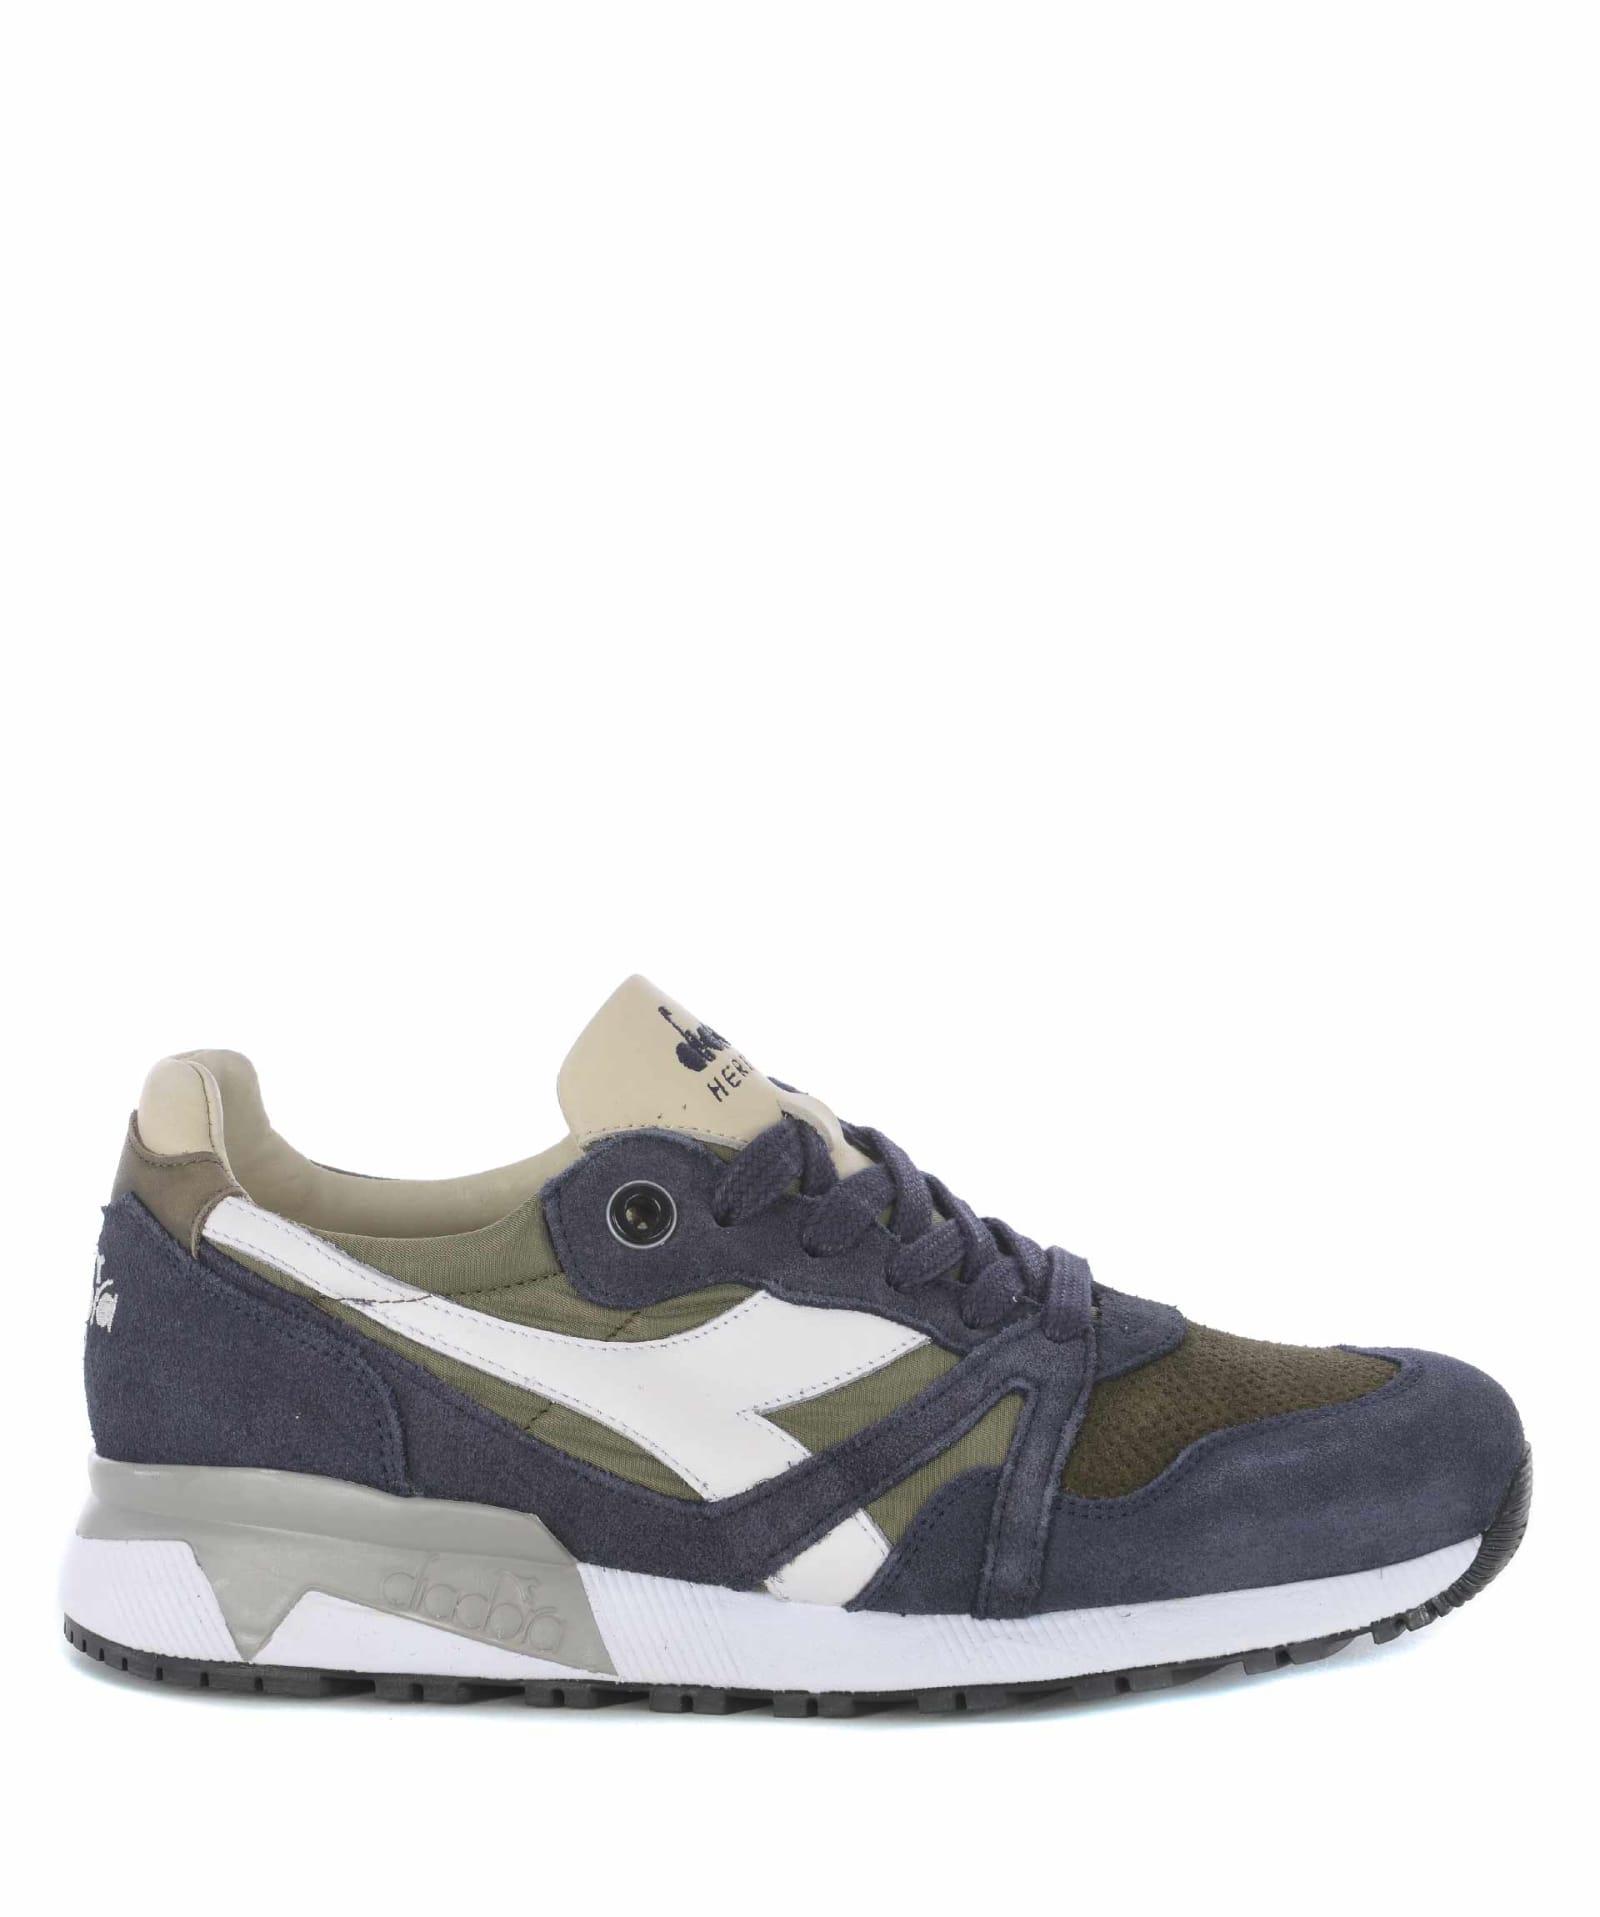 online retailer 8c6fc 65696 Diadora Heritage N9000 Sneakers - Blu/verde militare ...